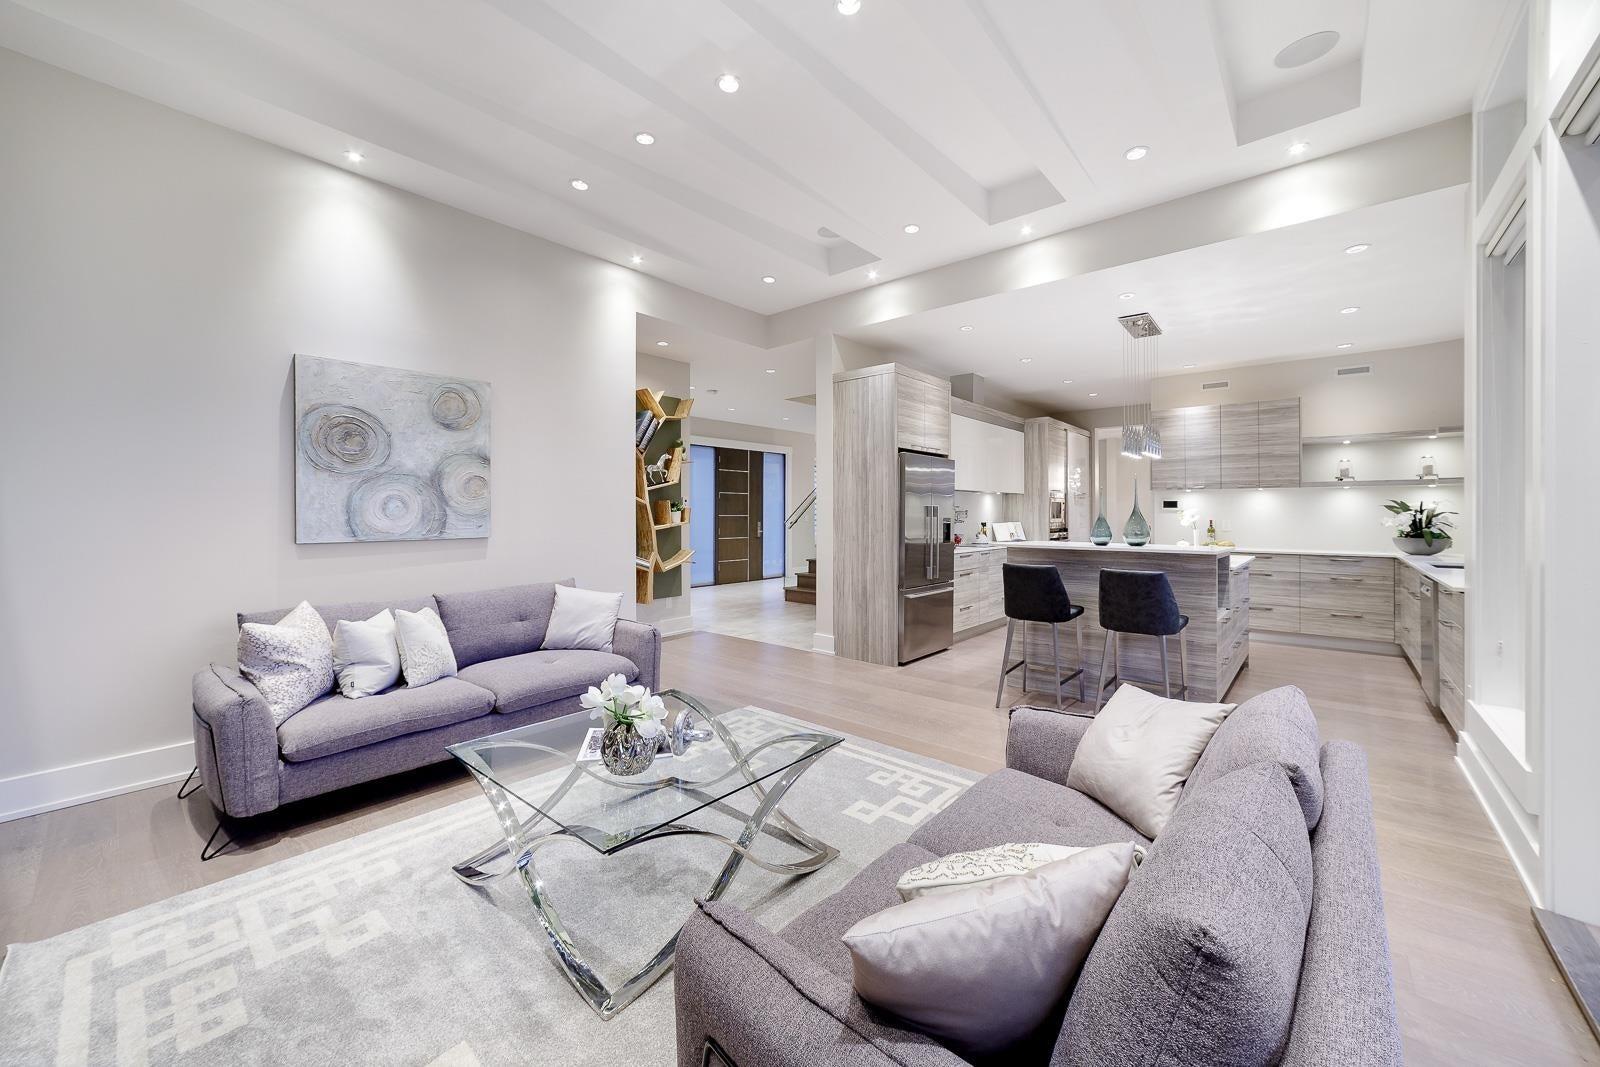 517 GRANADA CRESCENT - Upper Delbrook House/Single Family for sale, 8 Bedrooms (R2615057) - #7